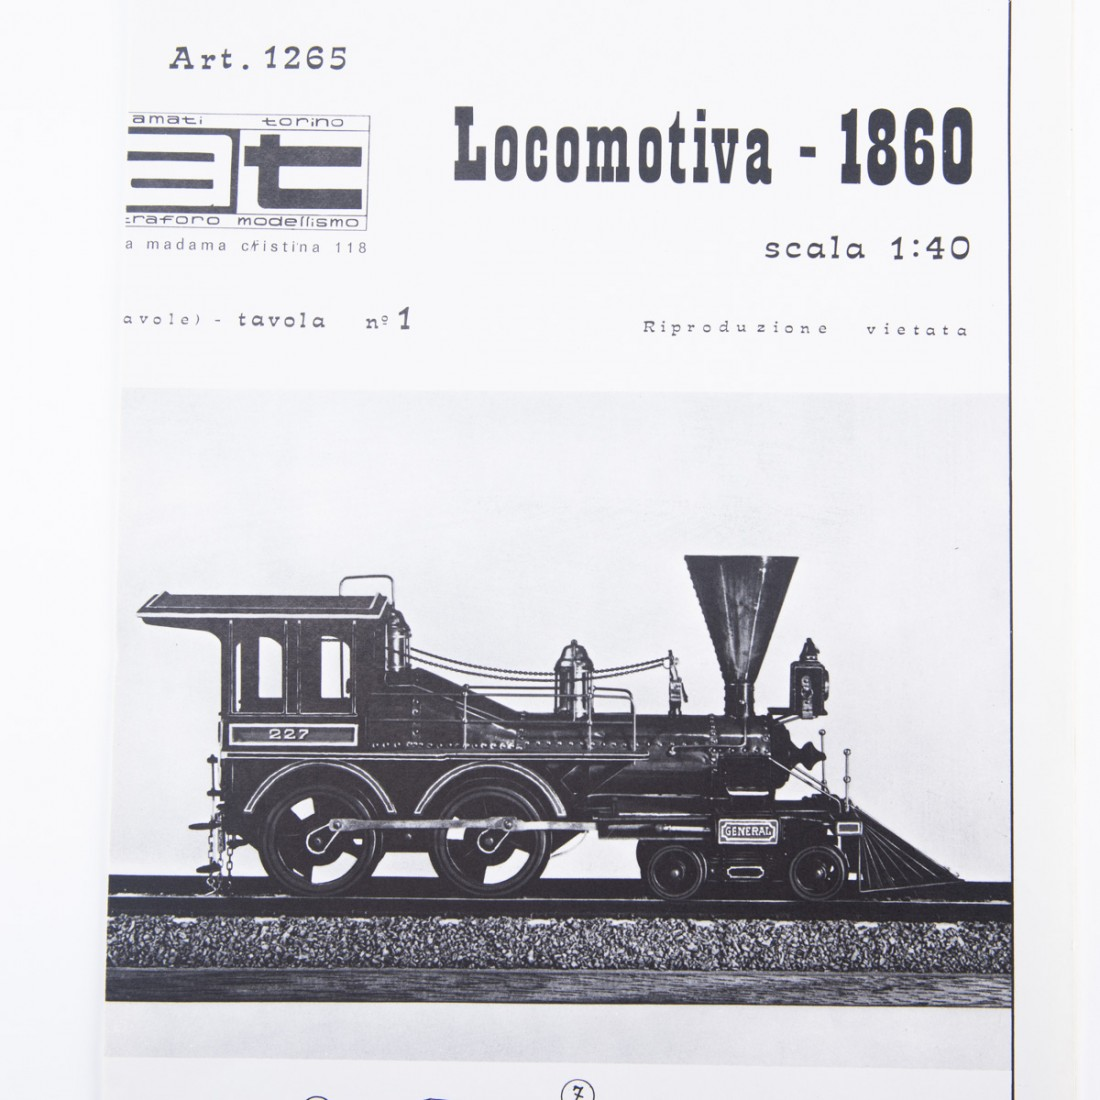 Locomotive Plan